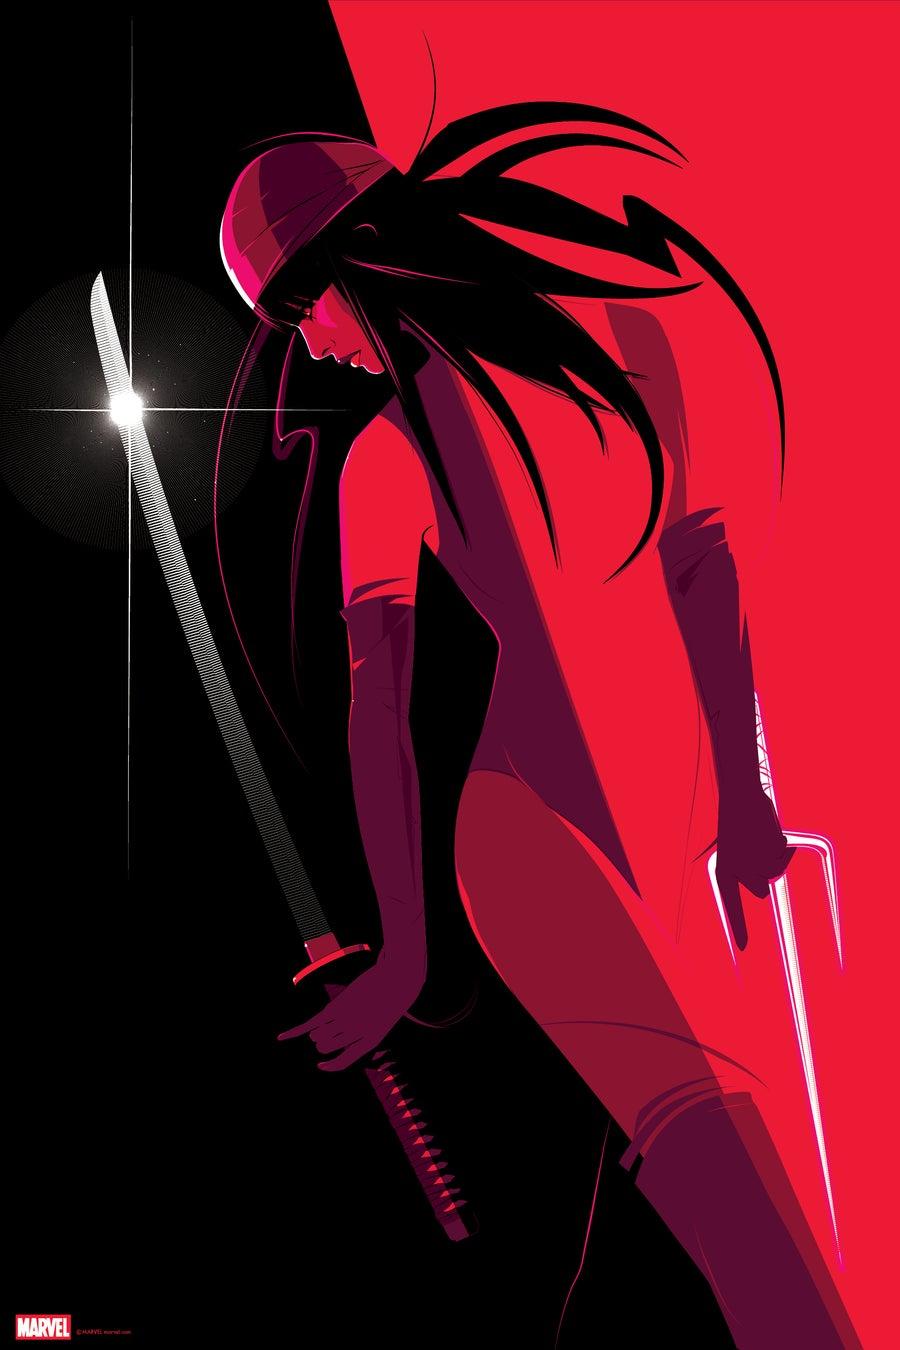 Image of Elektra